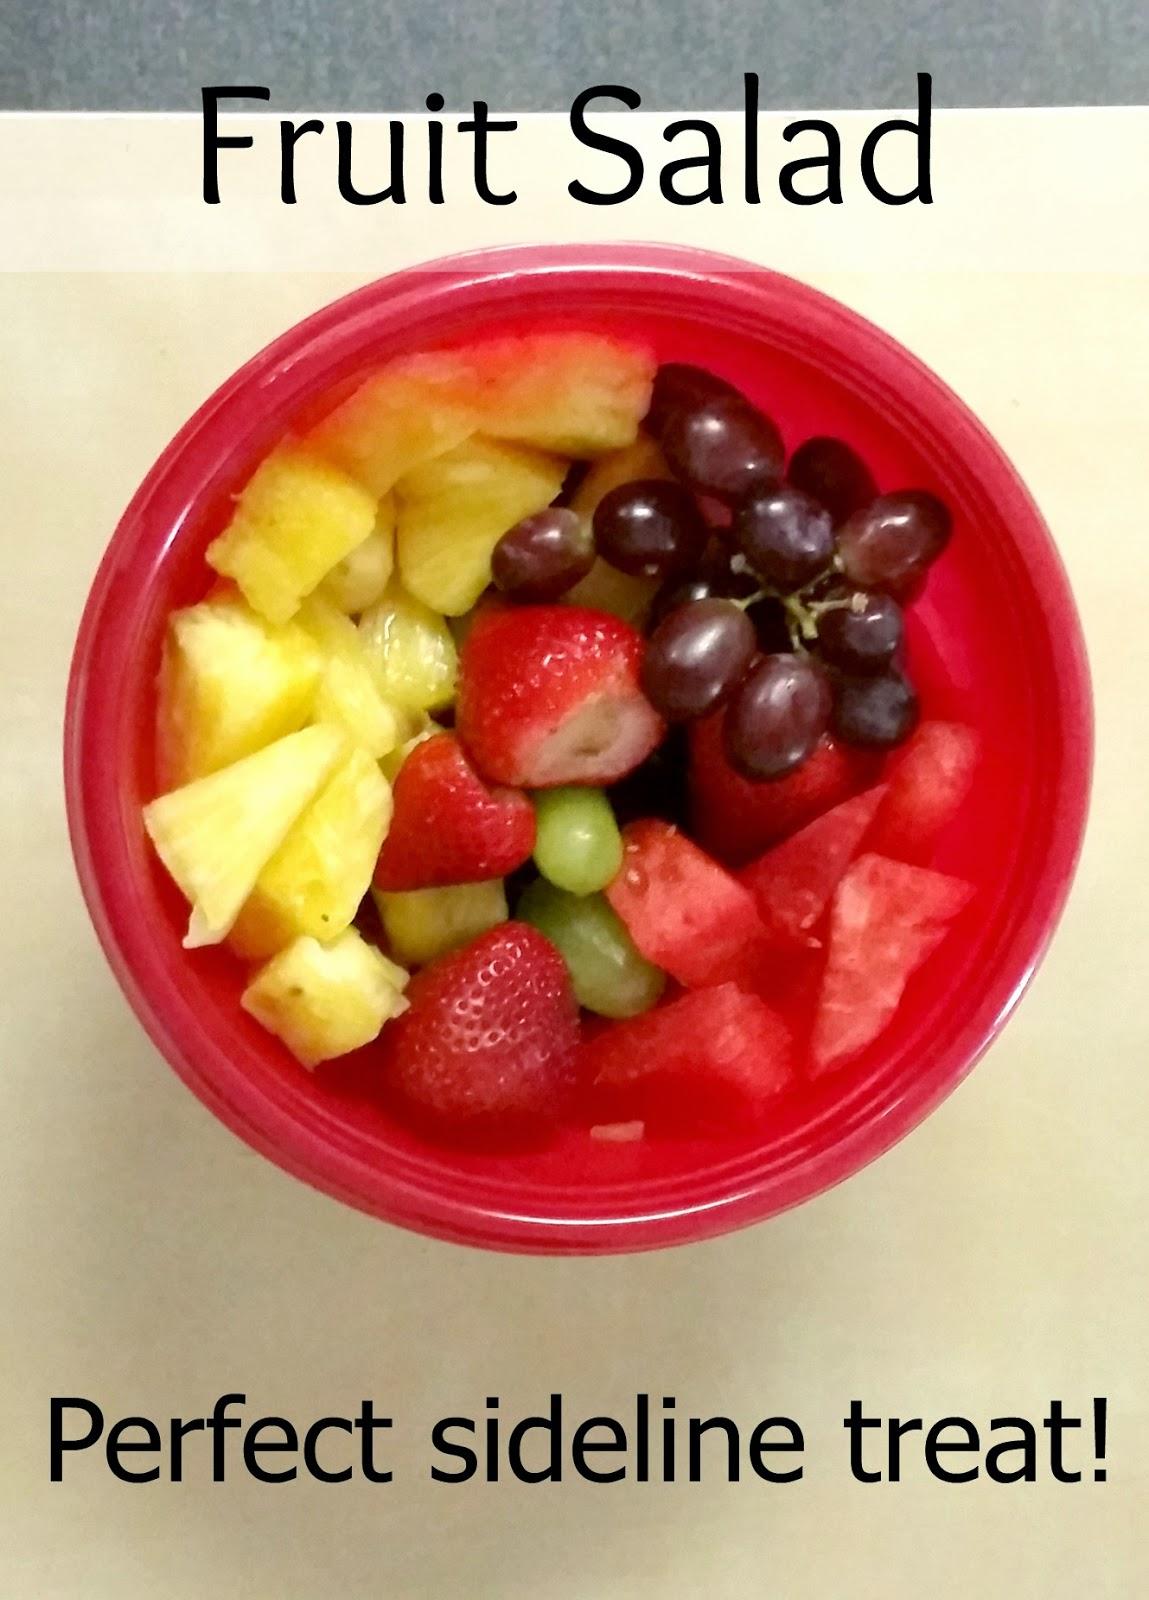 Fruit bowls are the perfect sideline treat! #SidelineHero #ad